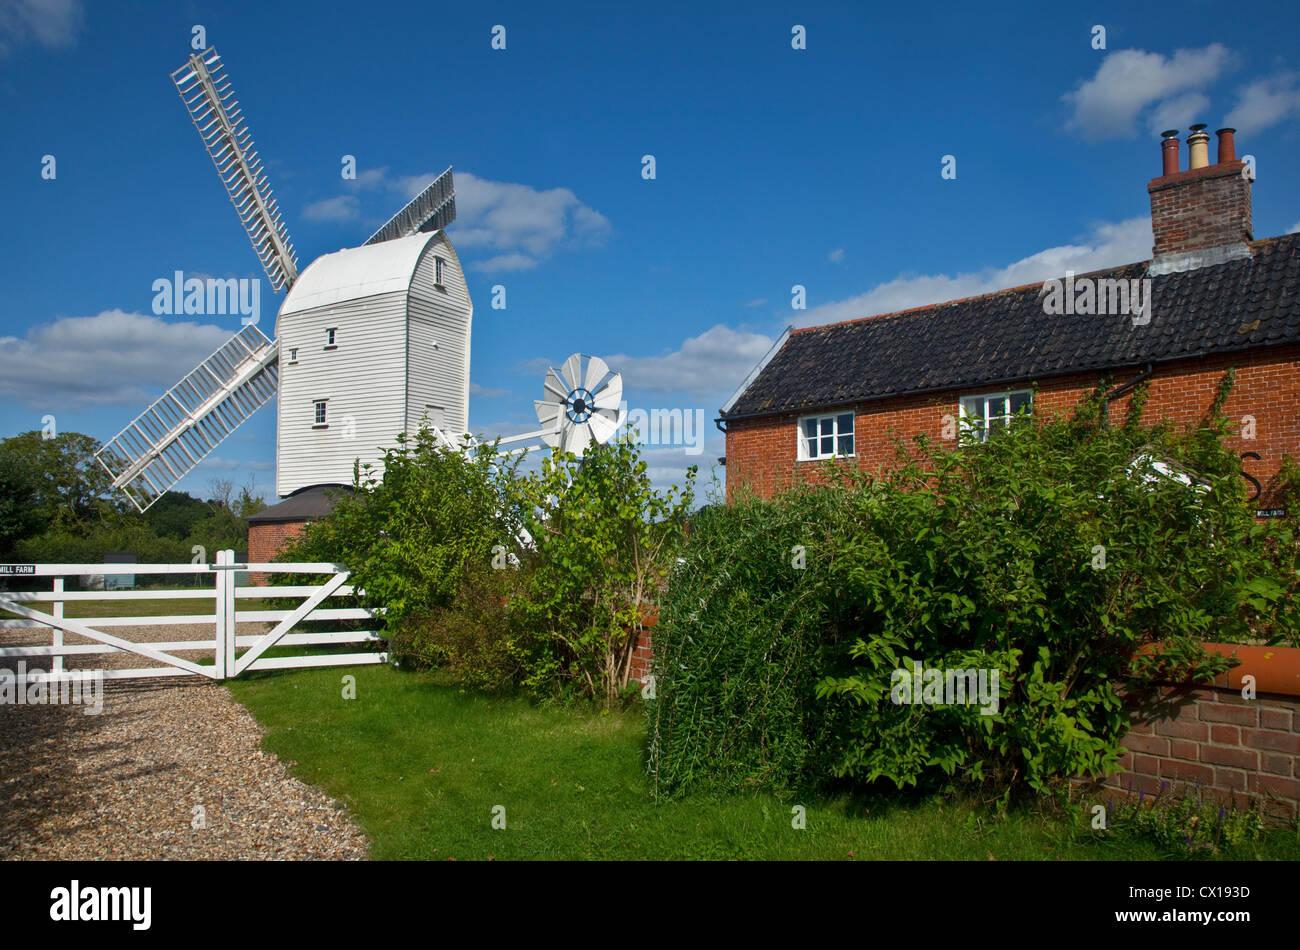 Stanton Post Mill (Windmill), Stanton, Suffolk, England - Stock Image